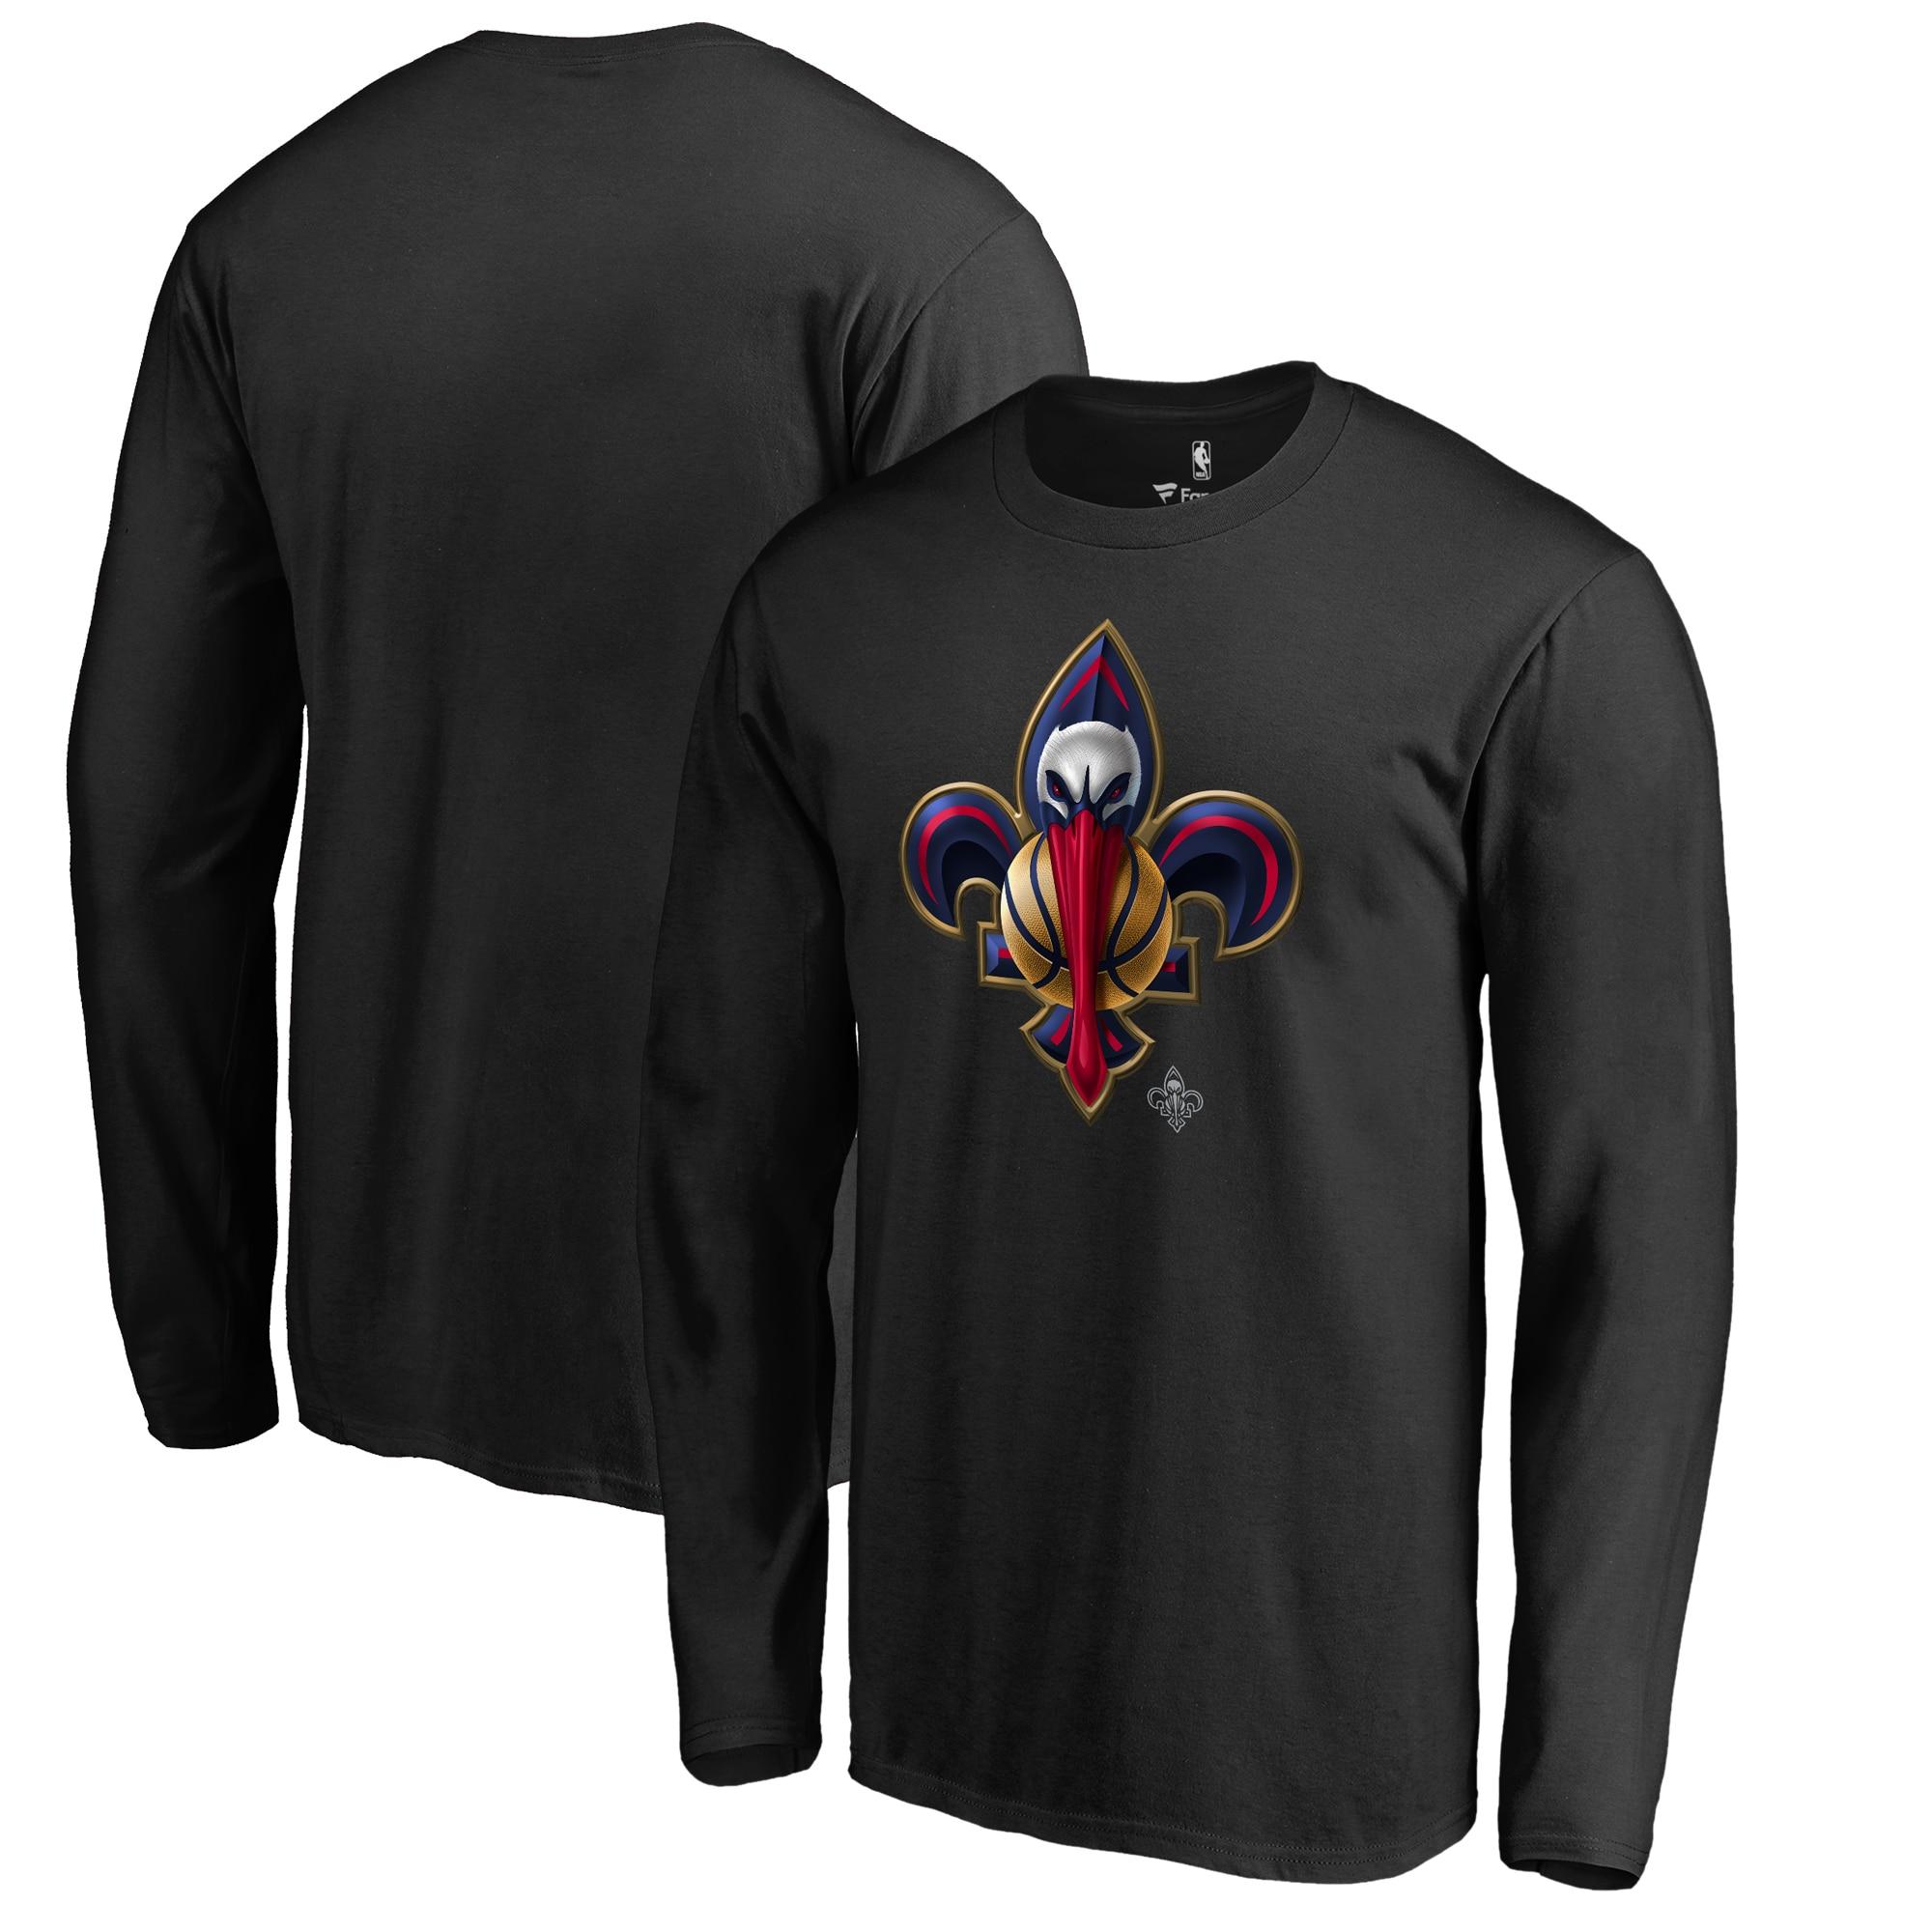 New Orleans Pelicans Fanatics Branded Midnight Mascot Long Sleeve T-Shirt - Black